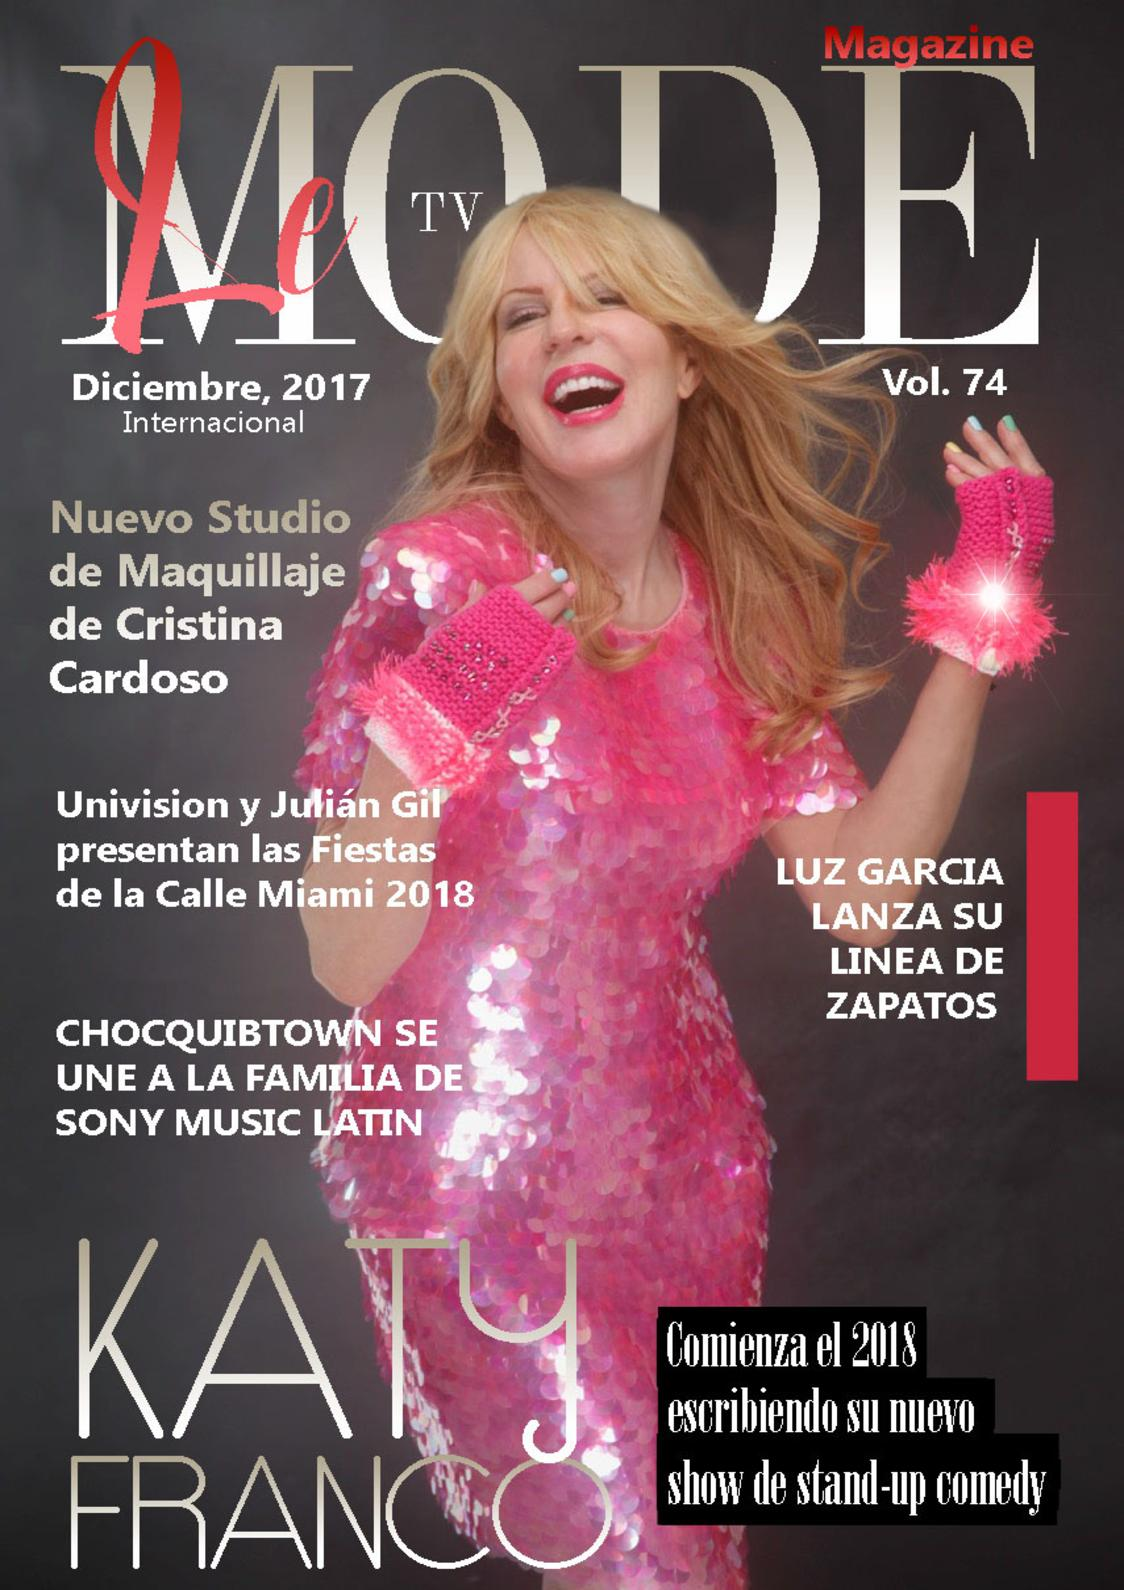 Calaméo - Le Mode Tv Magazine Katy Franco